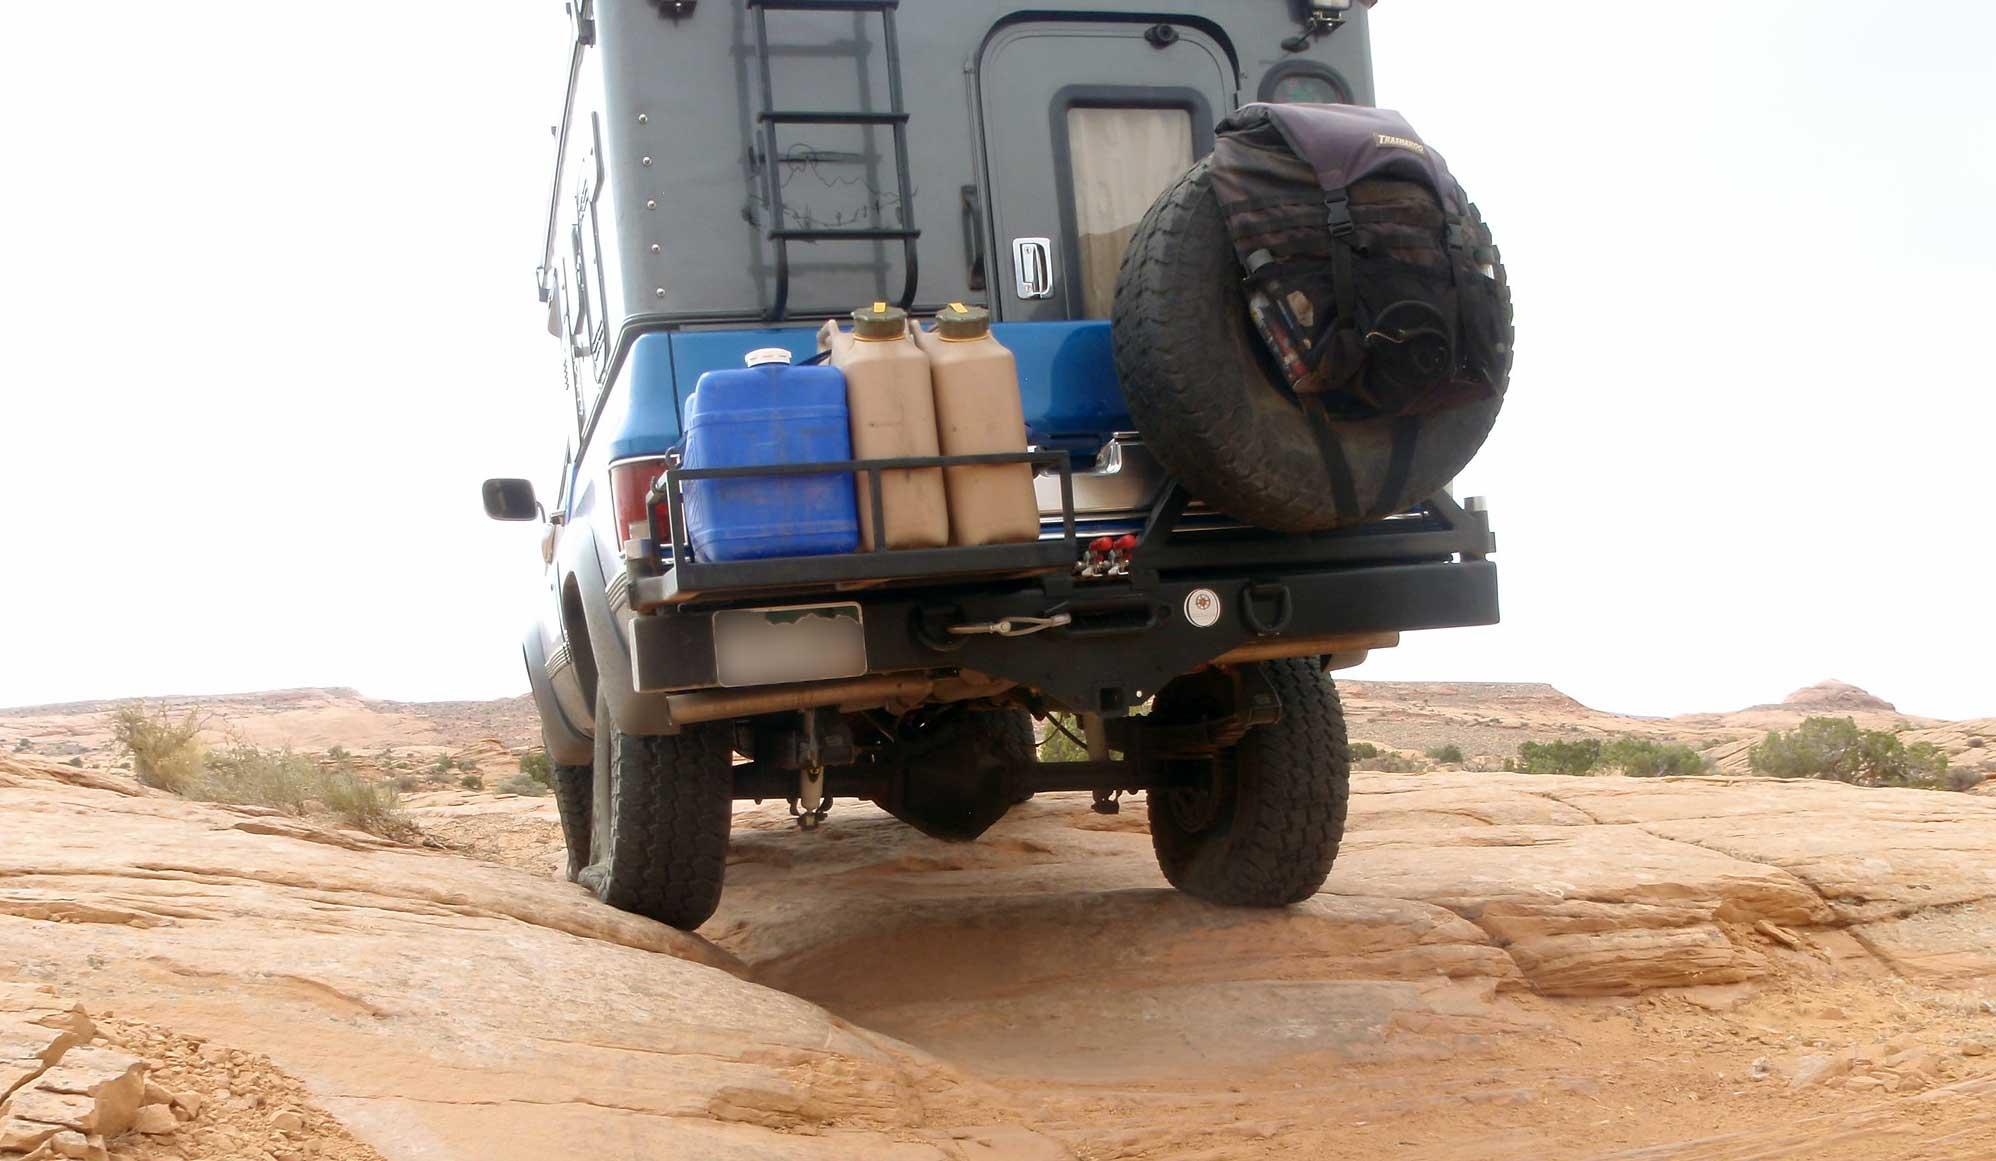 Jeep Trails In Utah With Truck Camper